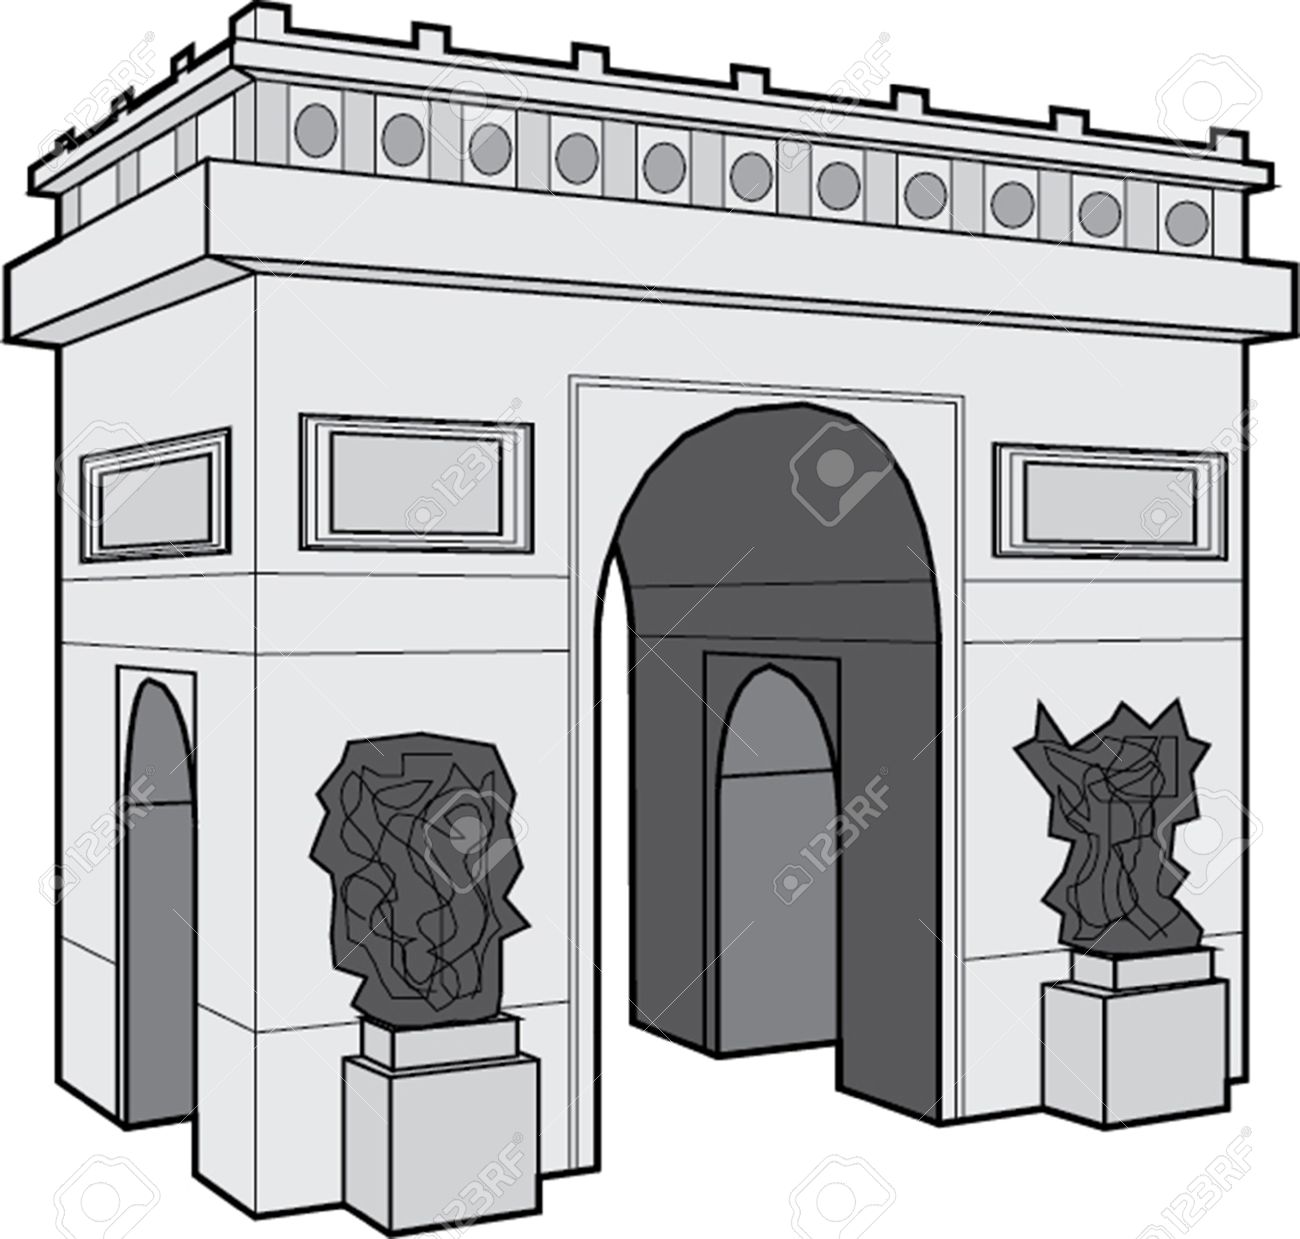 Arc De Triomphe Black and White Clip Art.